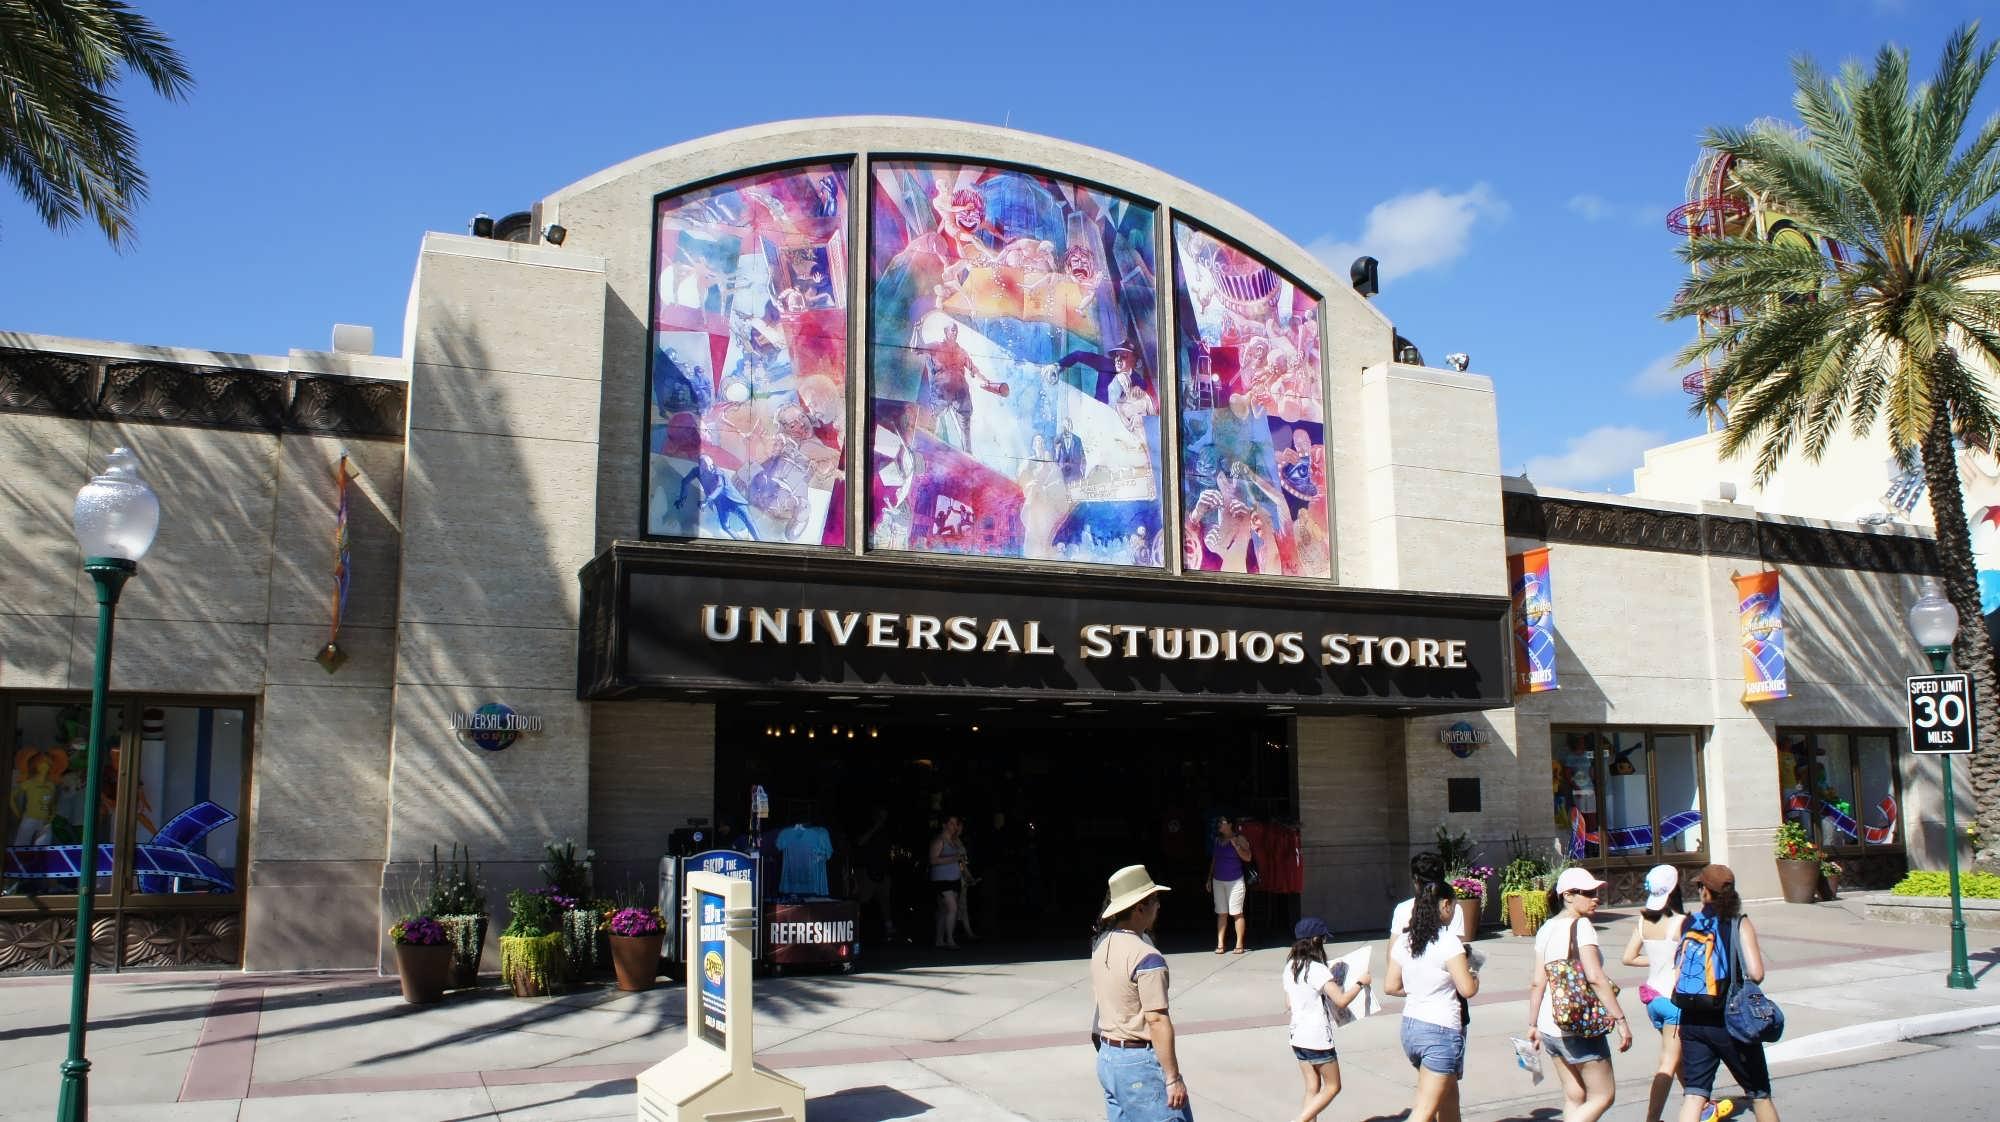 Image result for UNIVERSAL studios store orlando